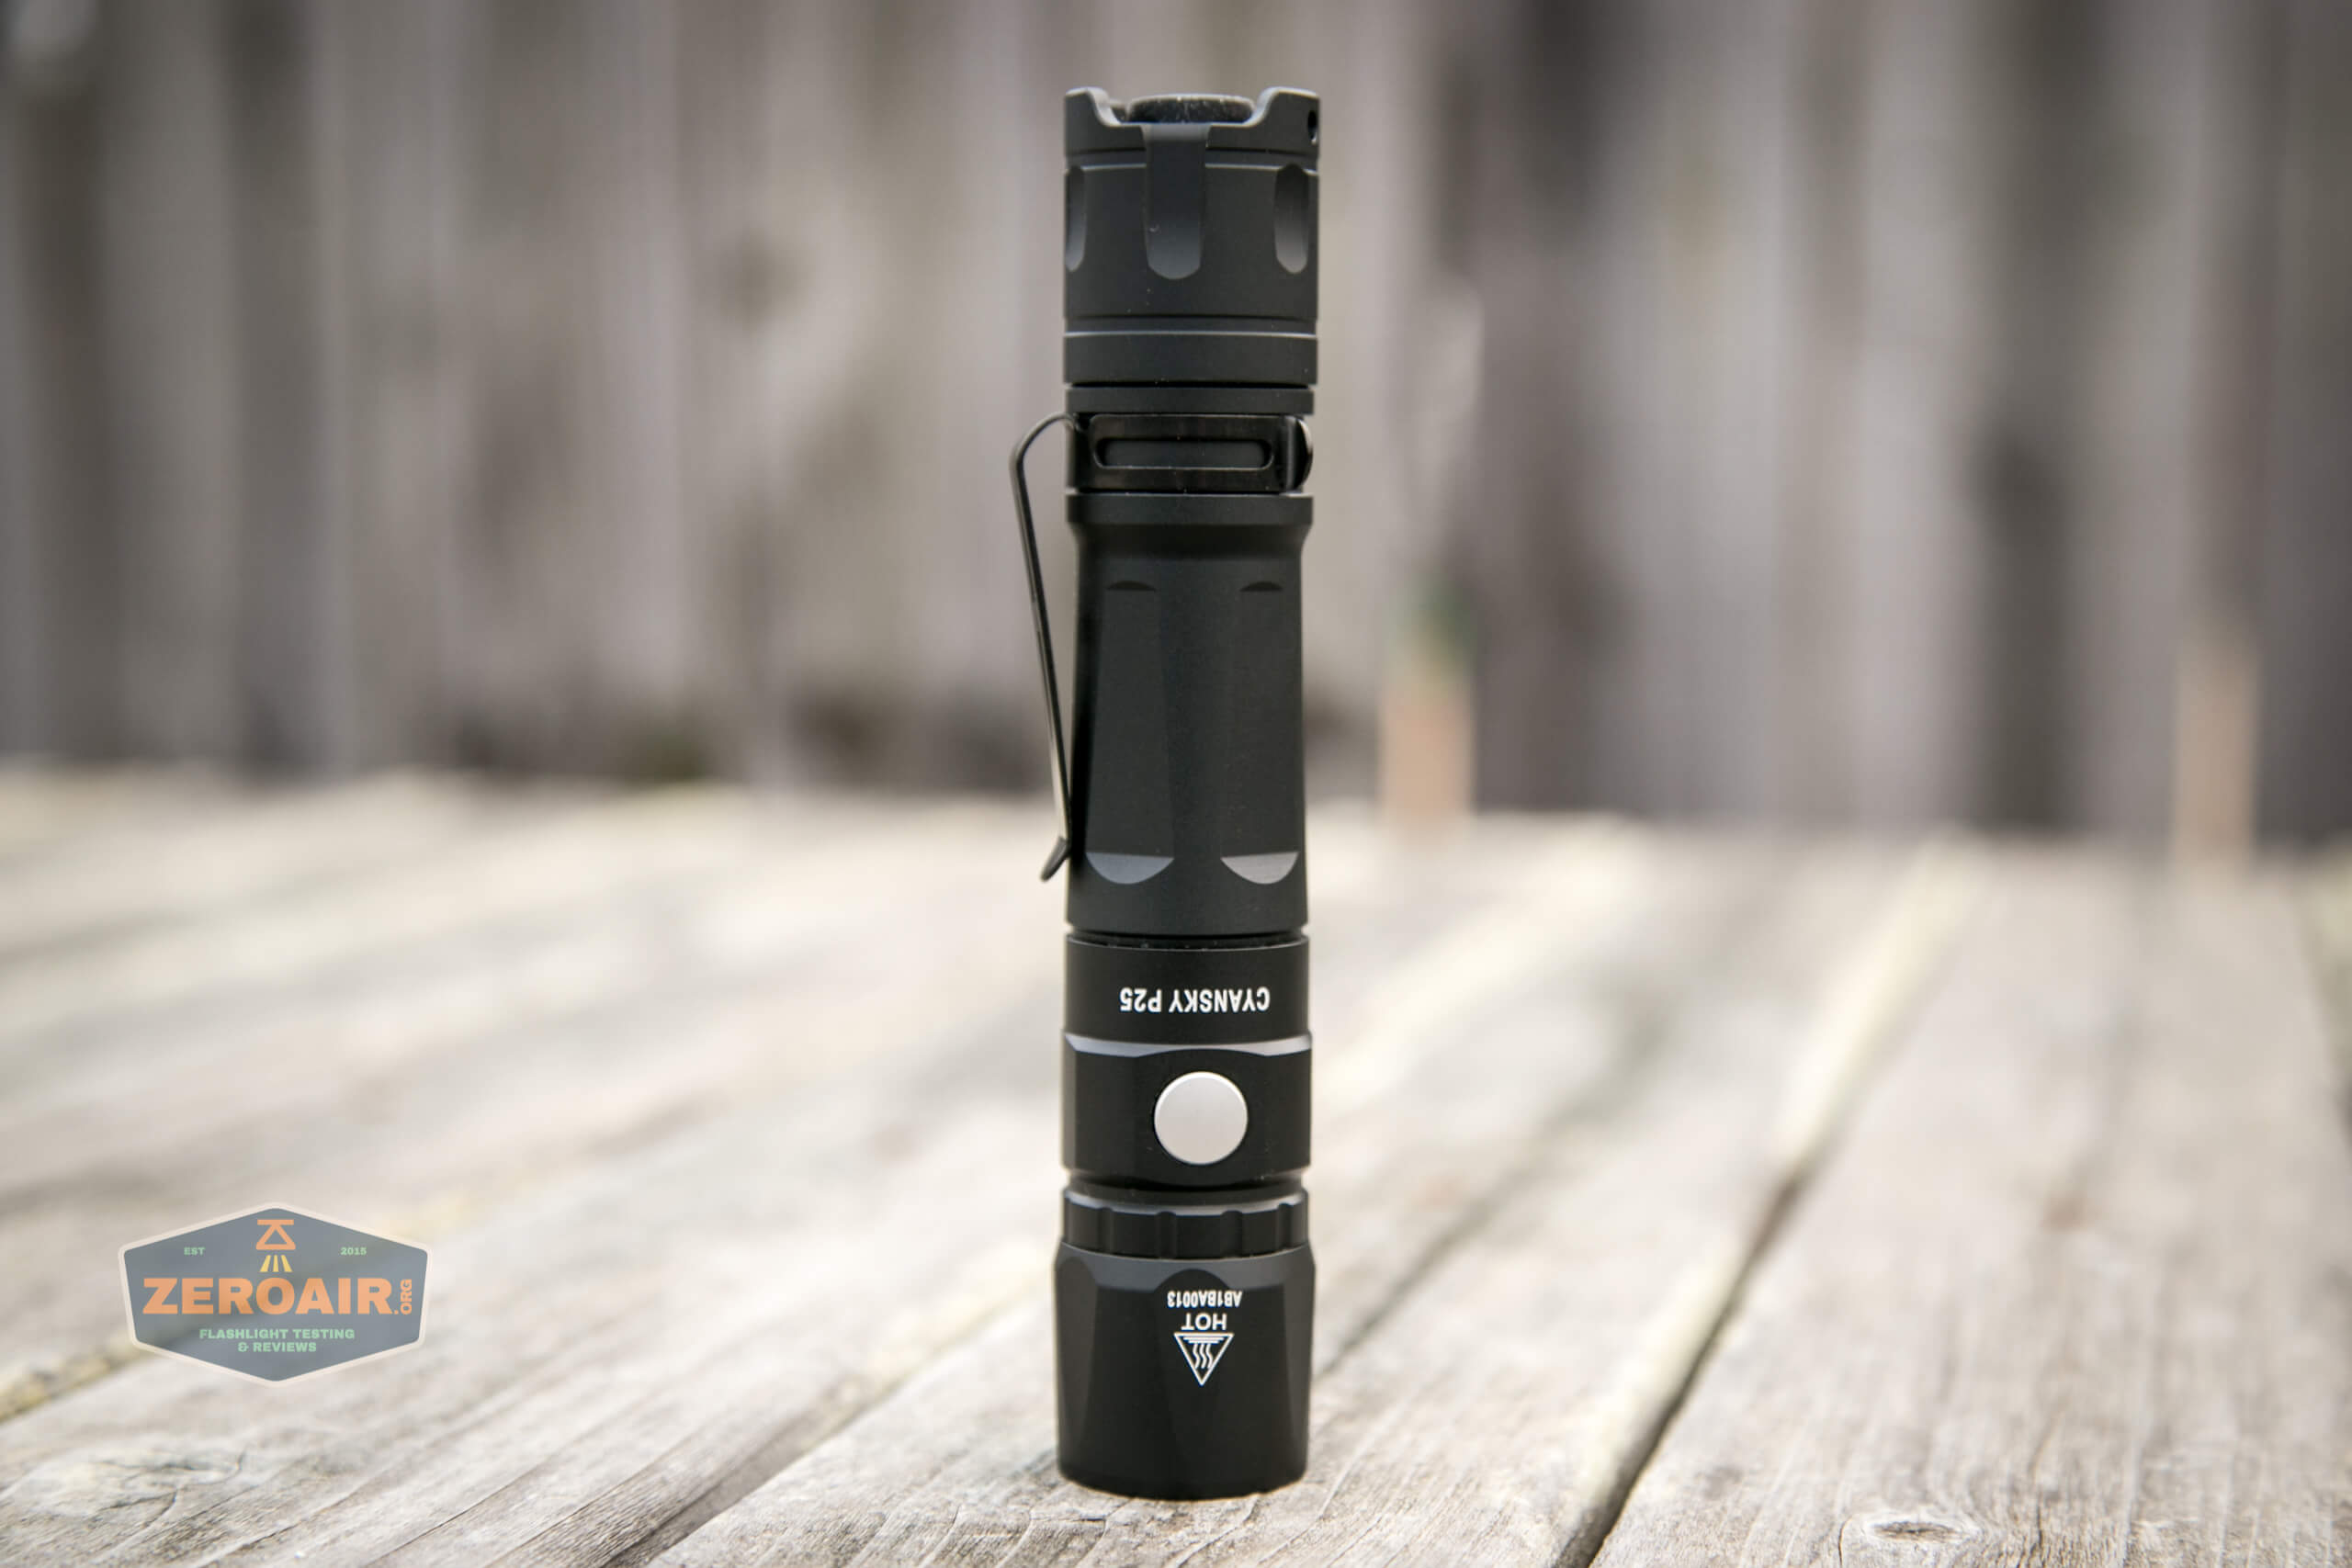 Cyansky P25 Flashlight headstanding